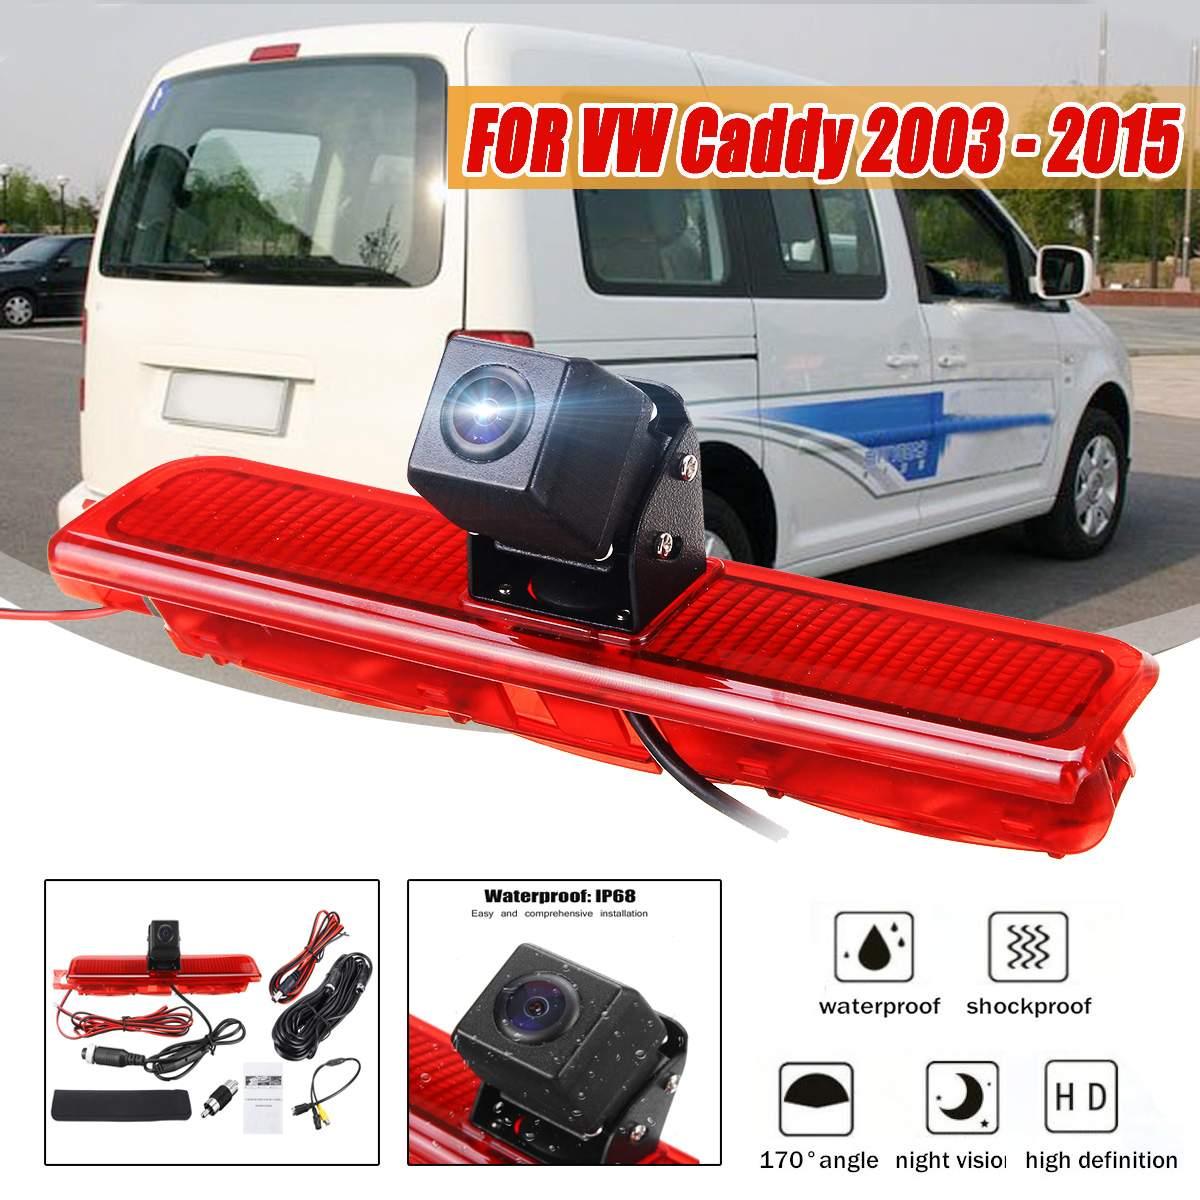 Caméra de recul de voiture caméra de recul frein de recul caméra de recul CMOS pour VW Caddy 2003-2015